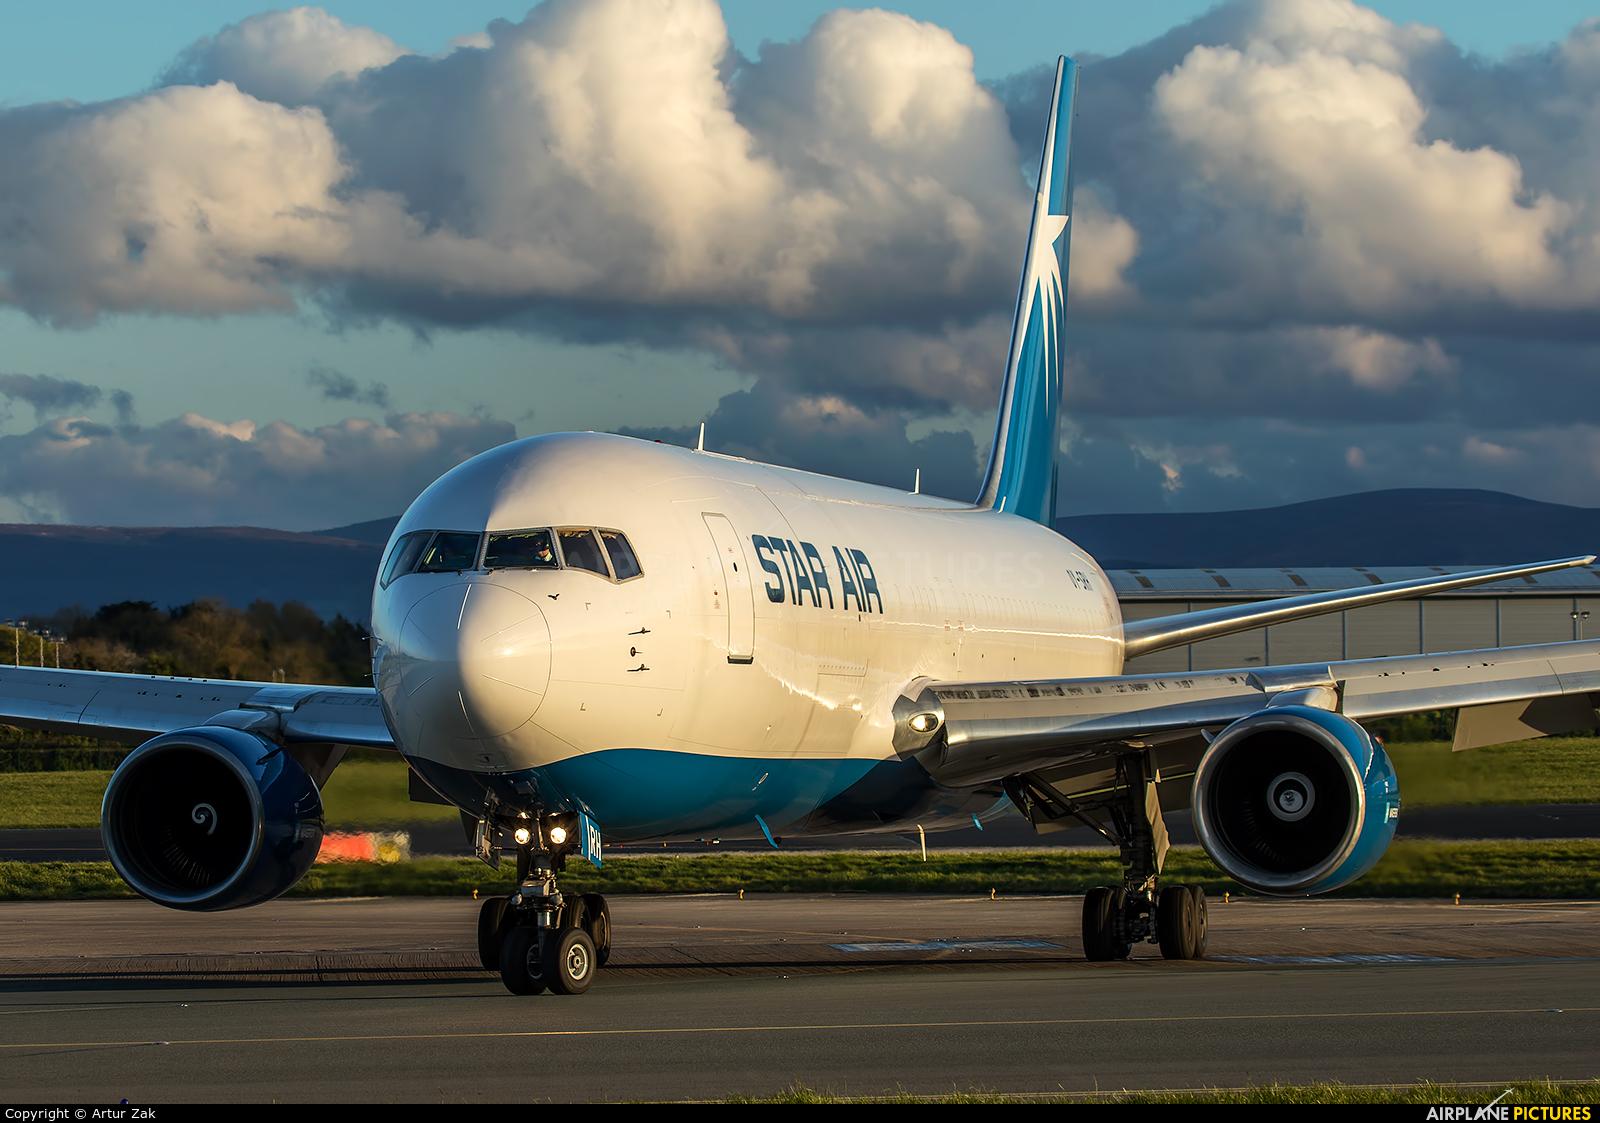 Star Air Freight OY-SRH aircraft at Dublin